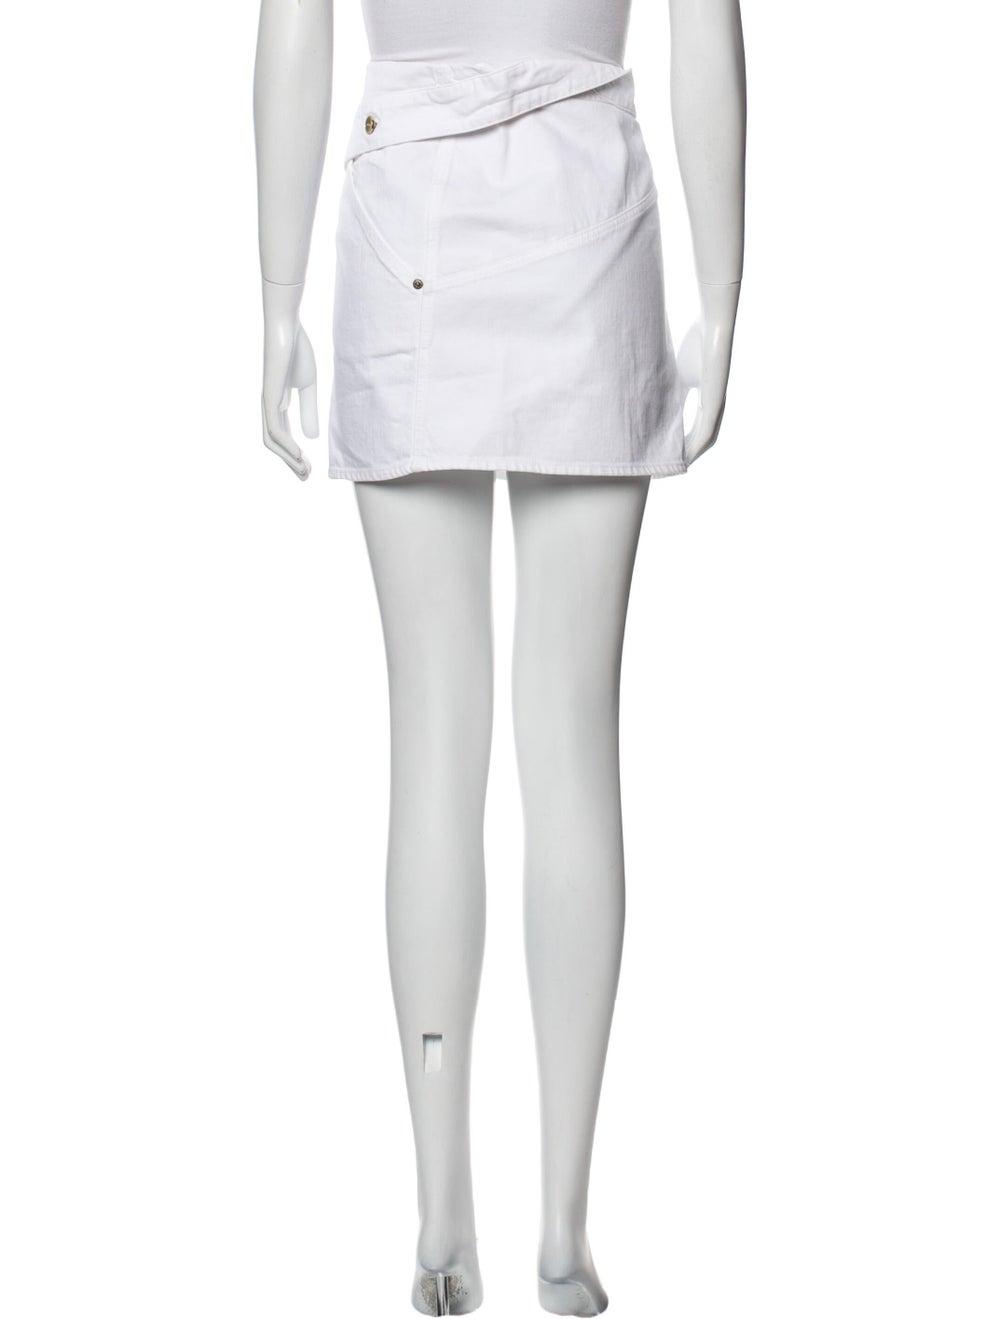 Jacquemus Mini Skirt - image 3